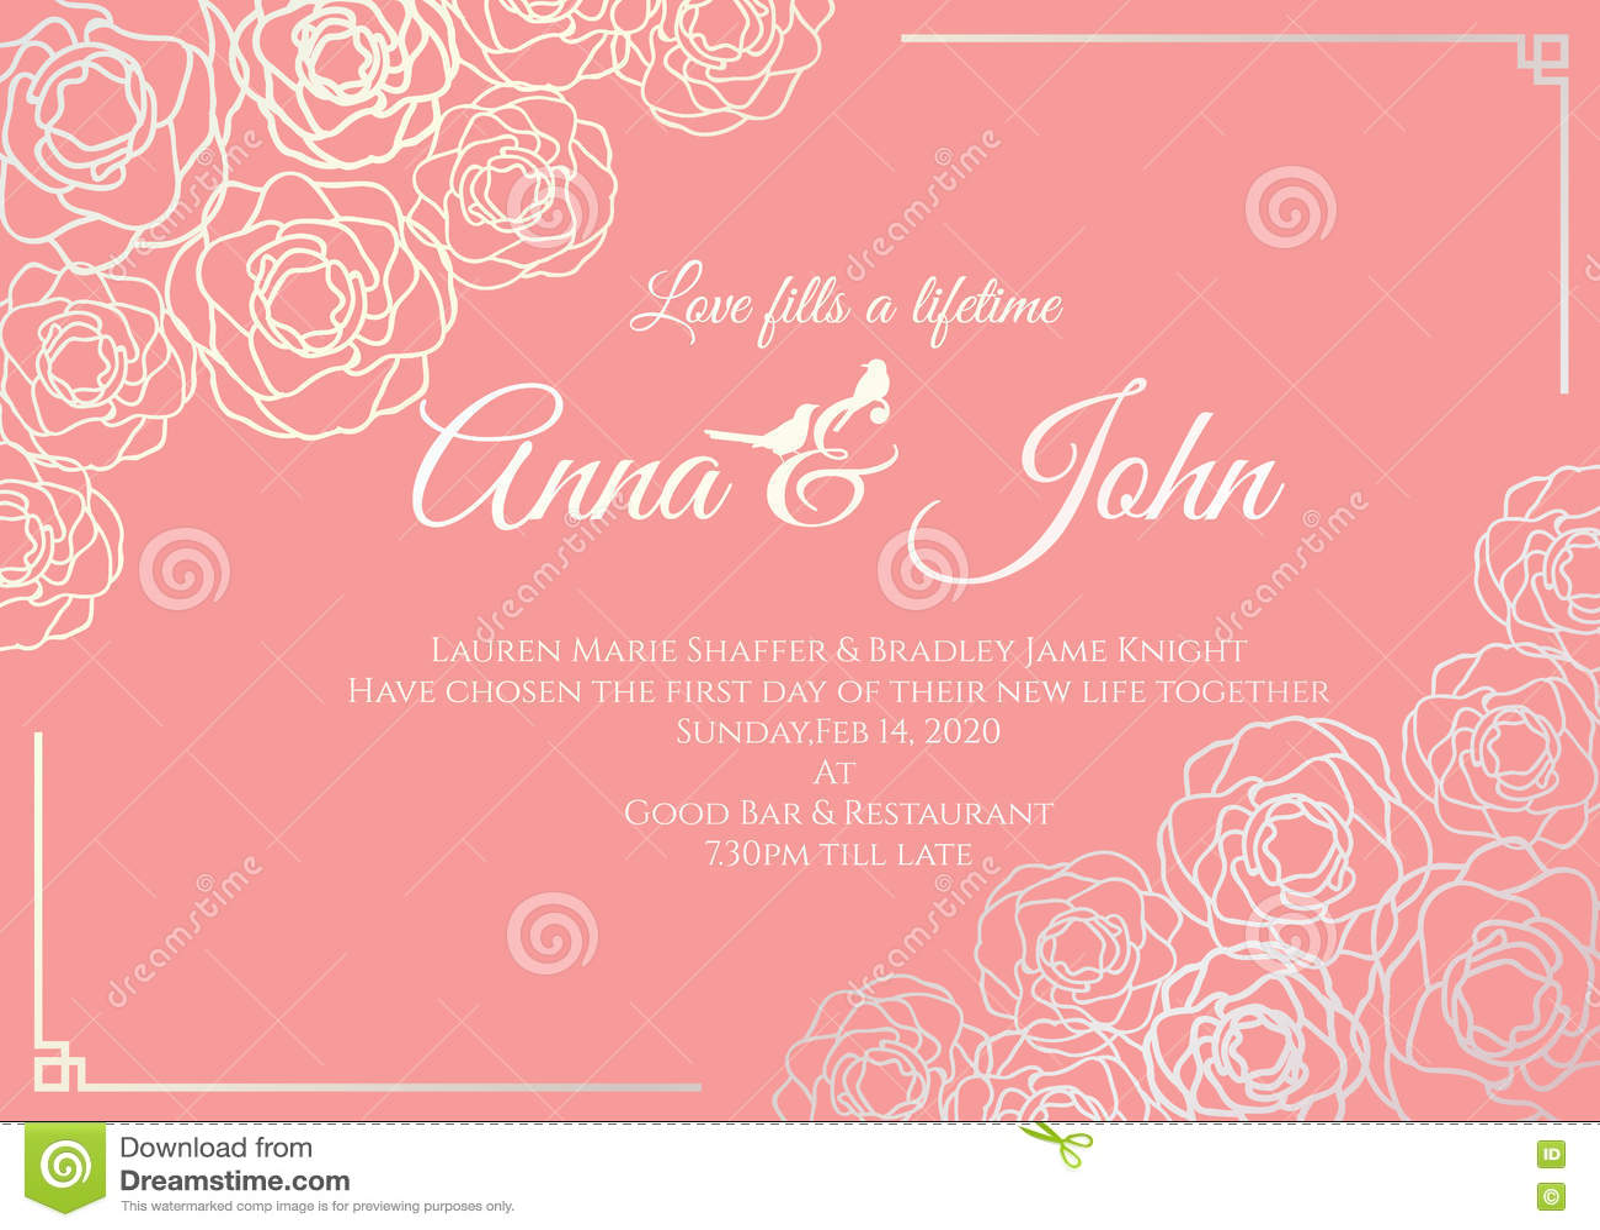 Wedding Card Silver Rose Floral Frame And Old Rose